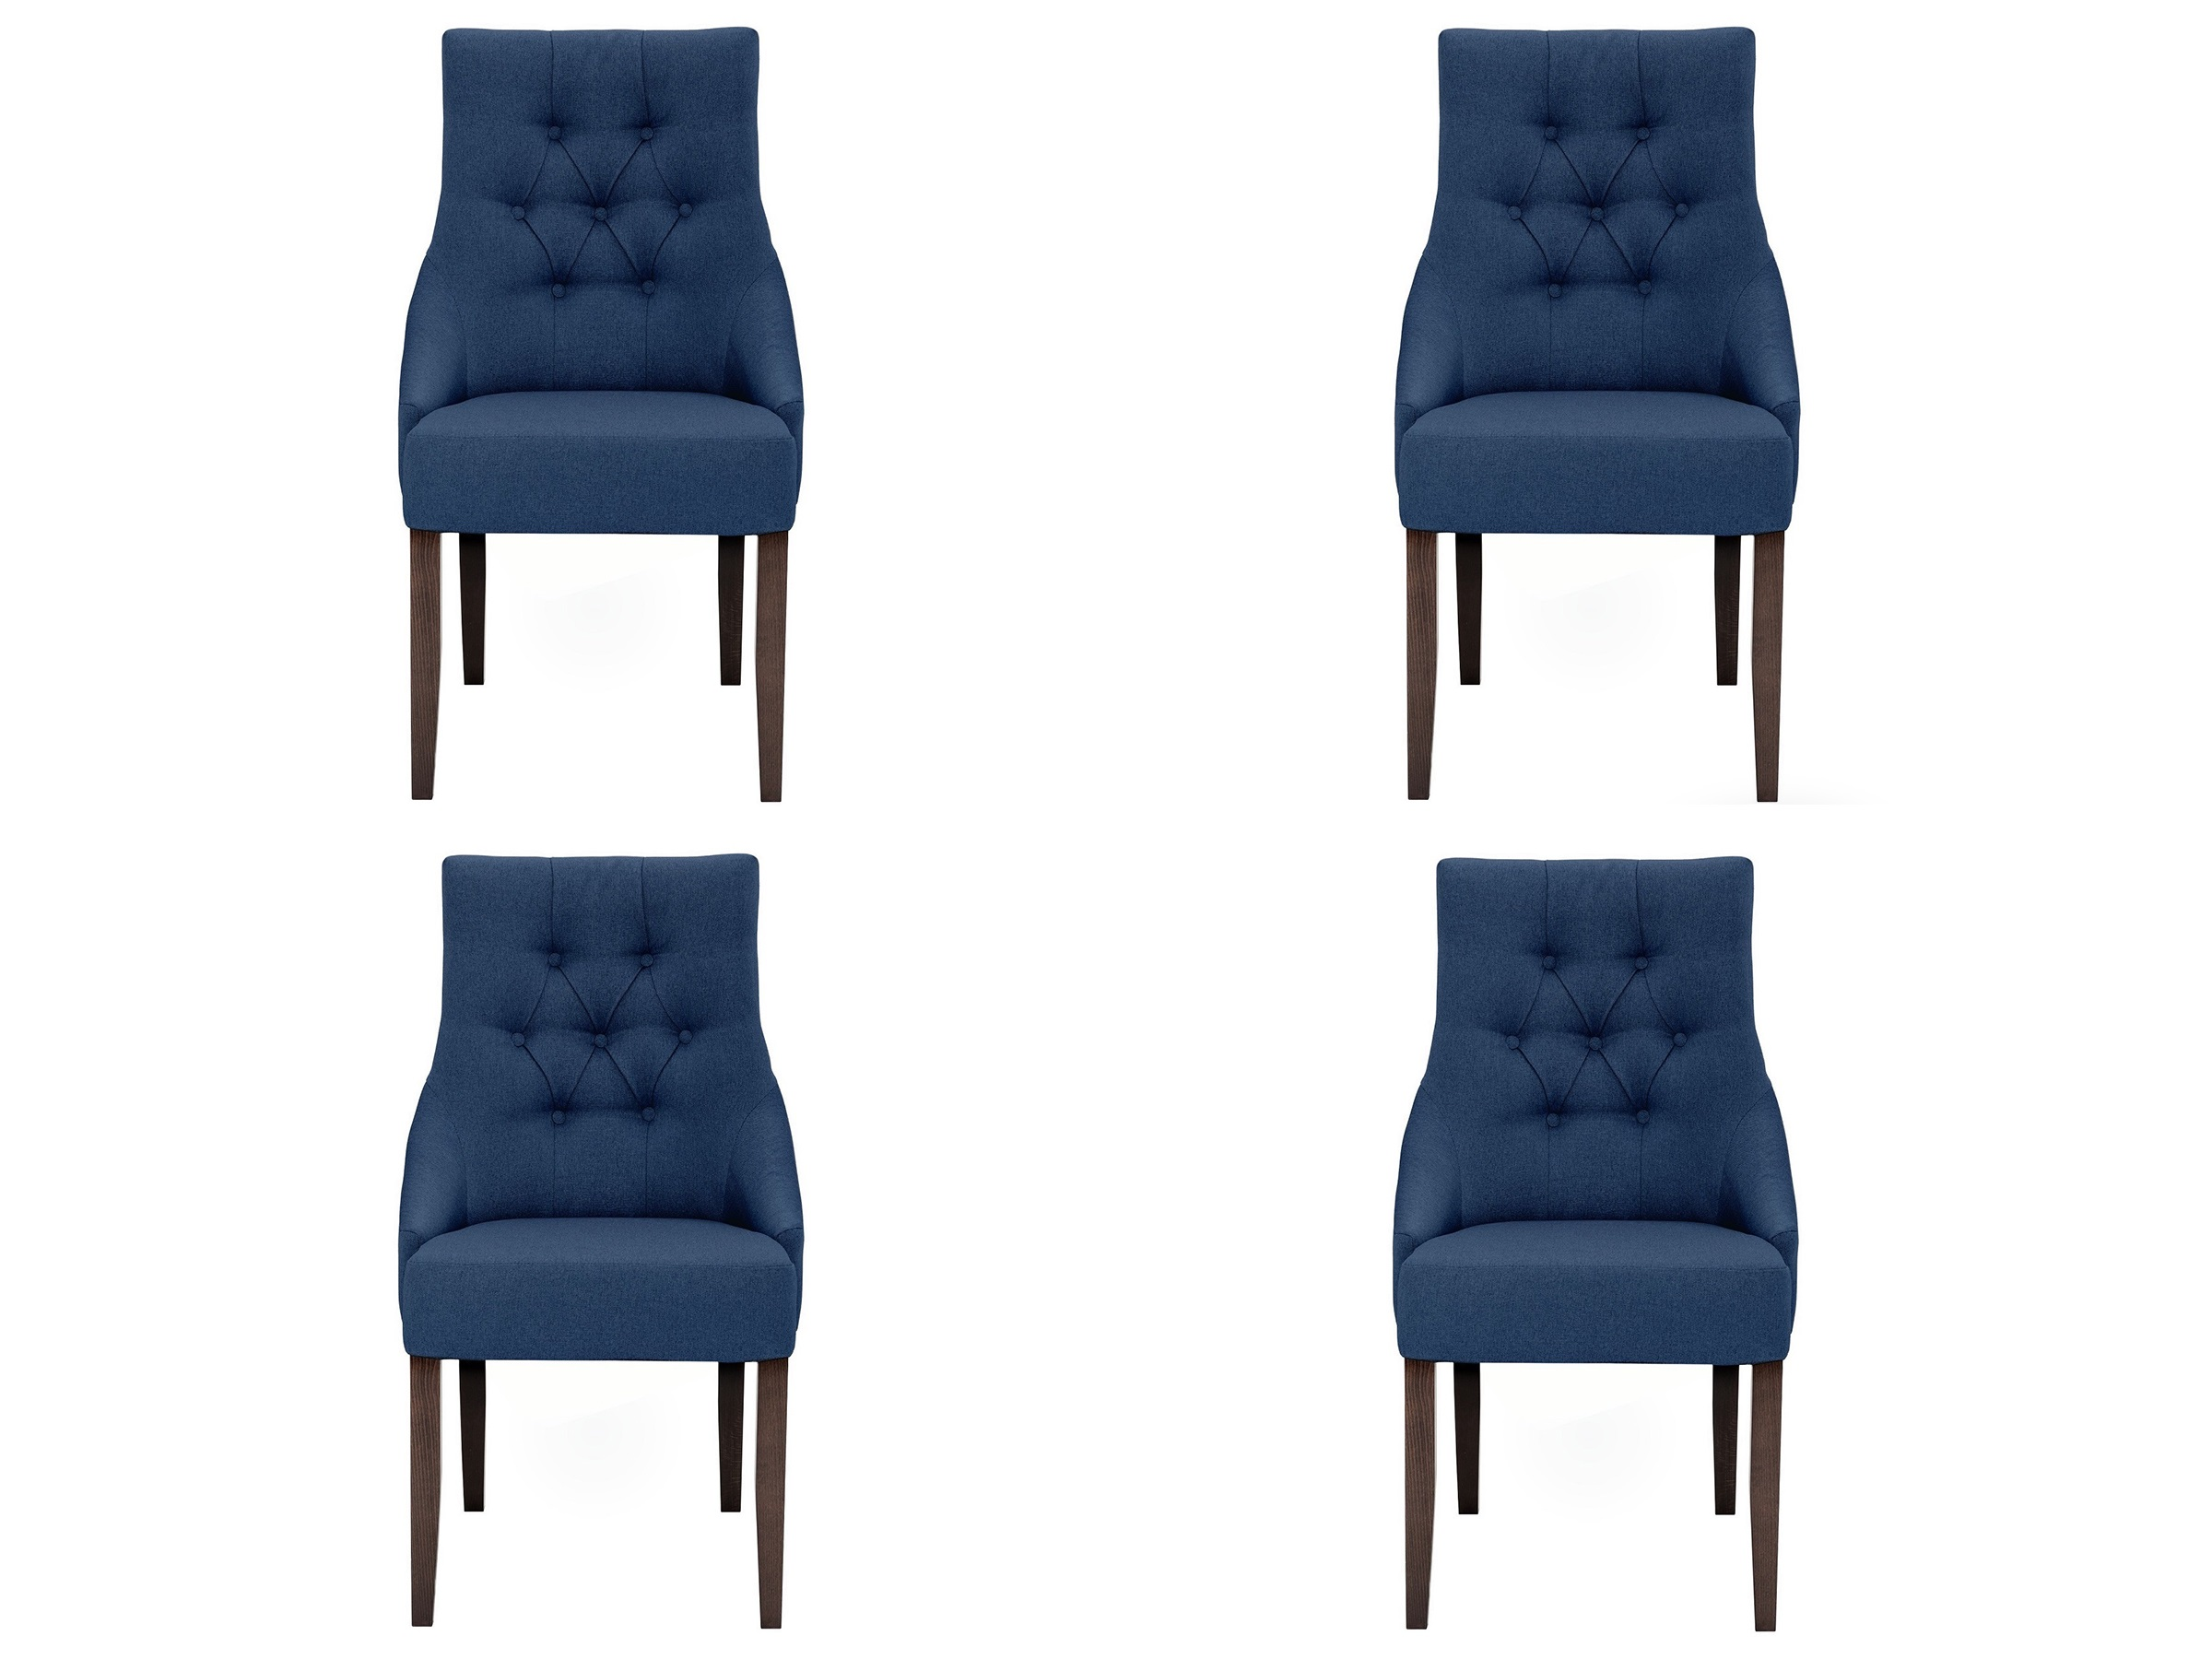 Комплект из 4 стульев classic (myfurnish) синий 52x102x70 см. фото